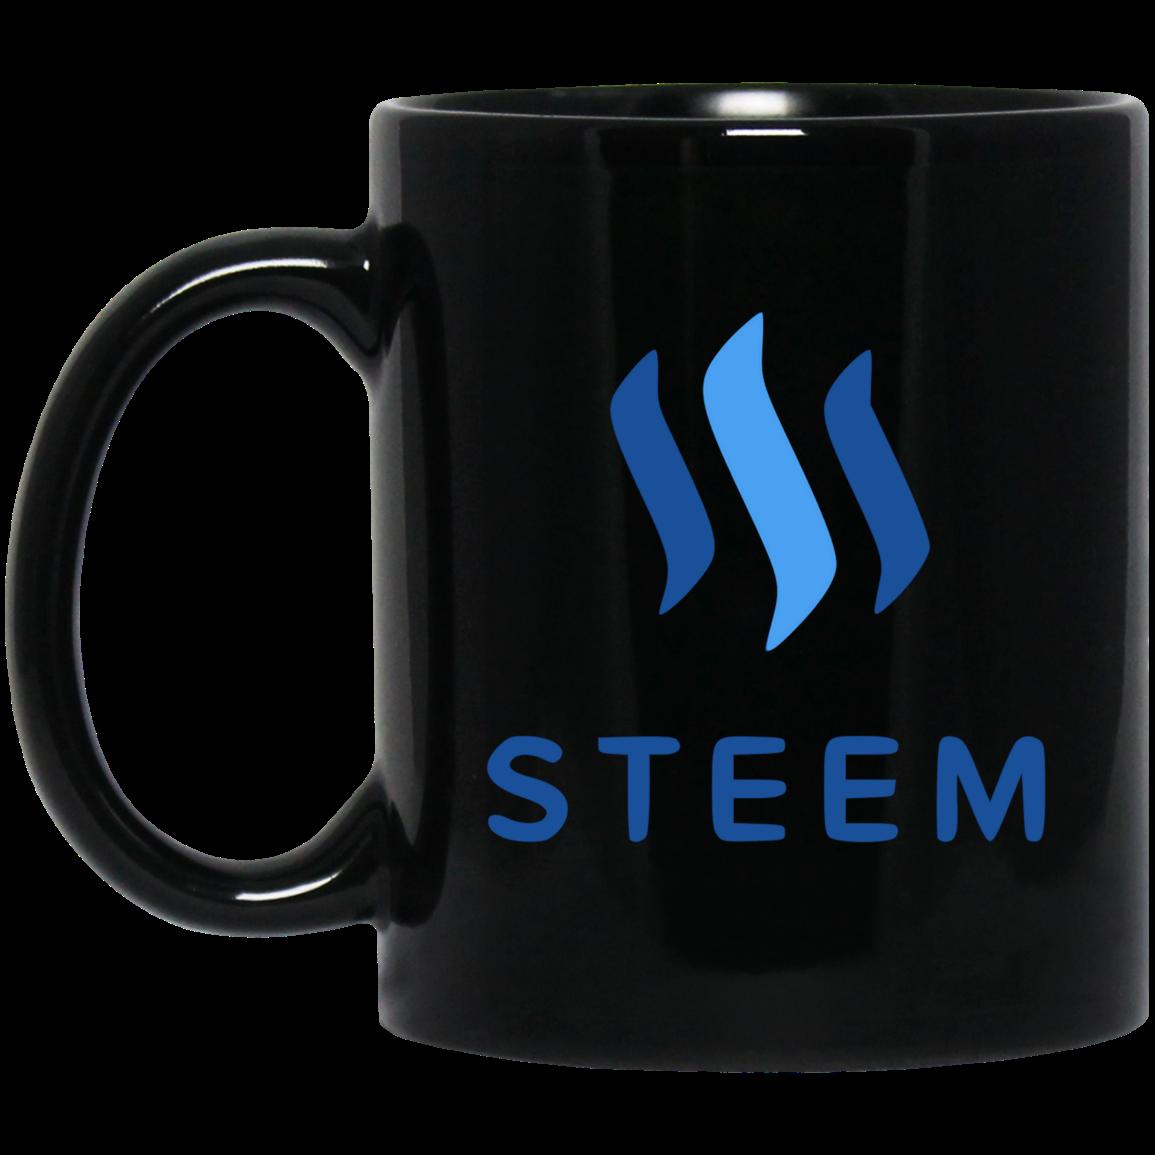 Steem - 11 oz. Black Mug TCP1607 Black / One Size Official Crypto  Merch